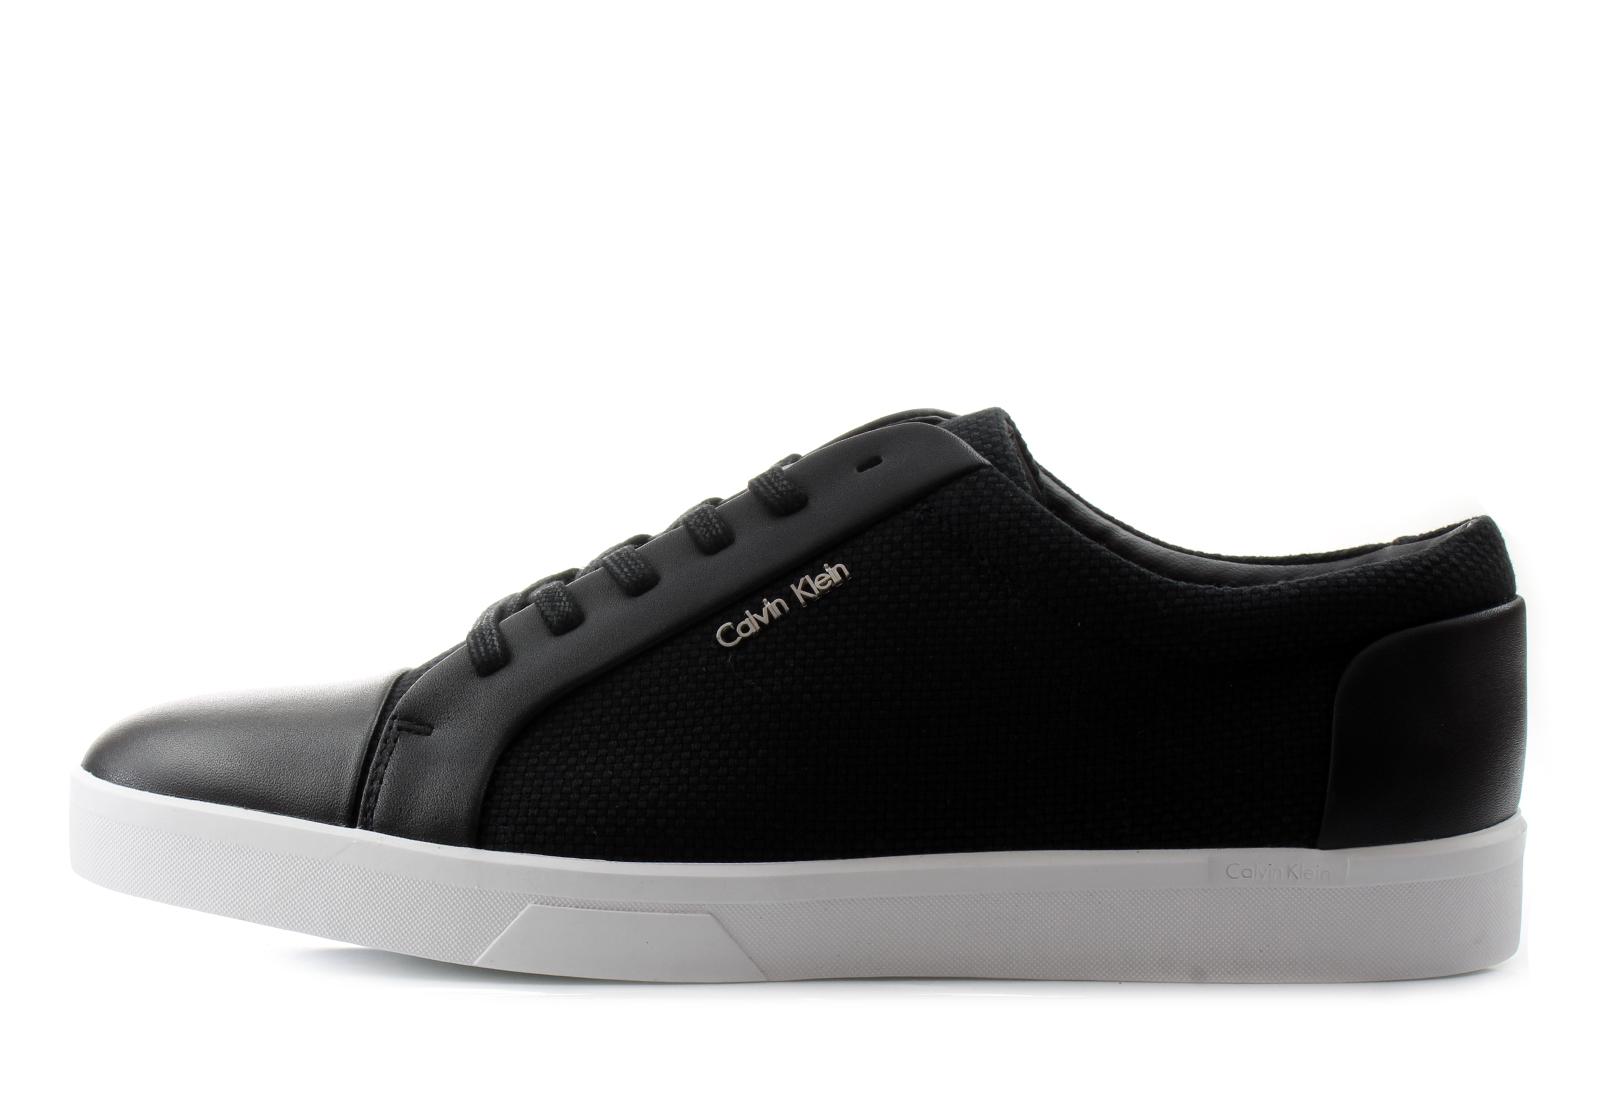 3ce26bd17c Calvin Klein Black Label Topánky - Igor - F1072-BLK - Tenisky ...